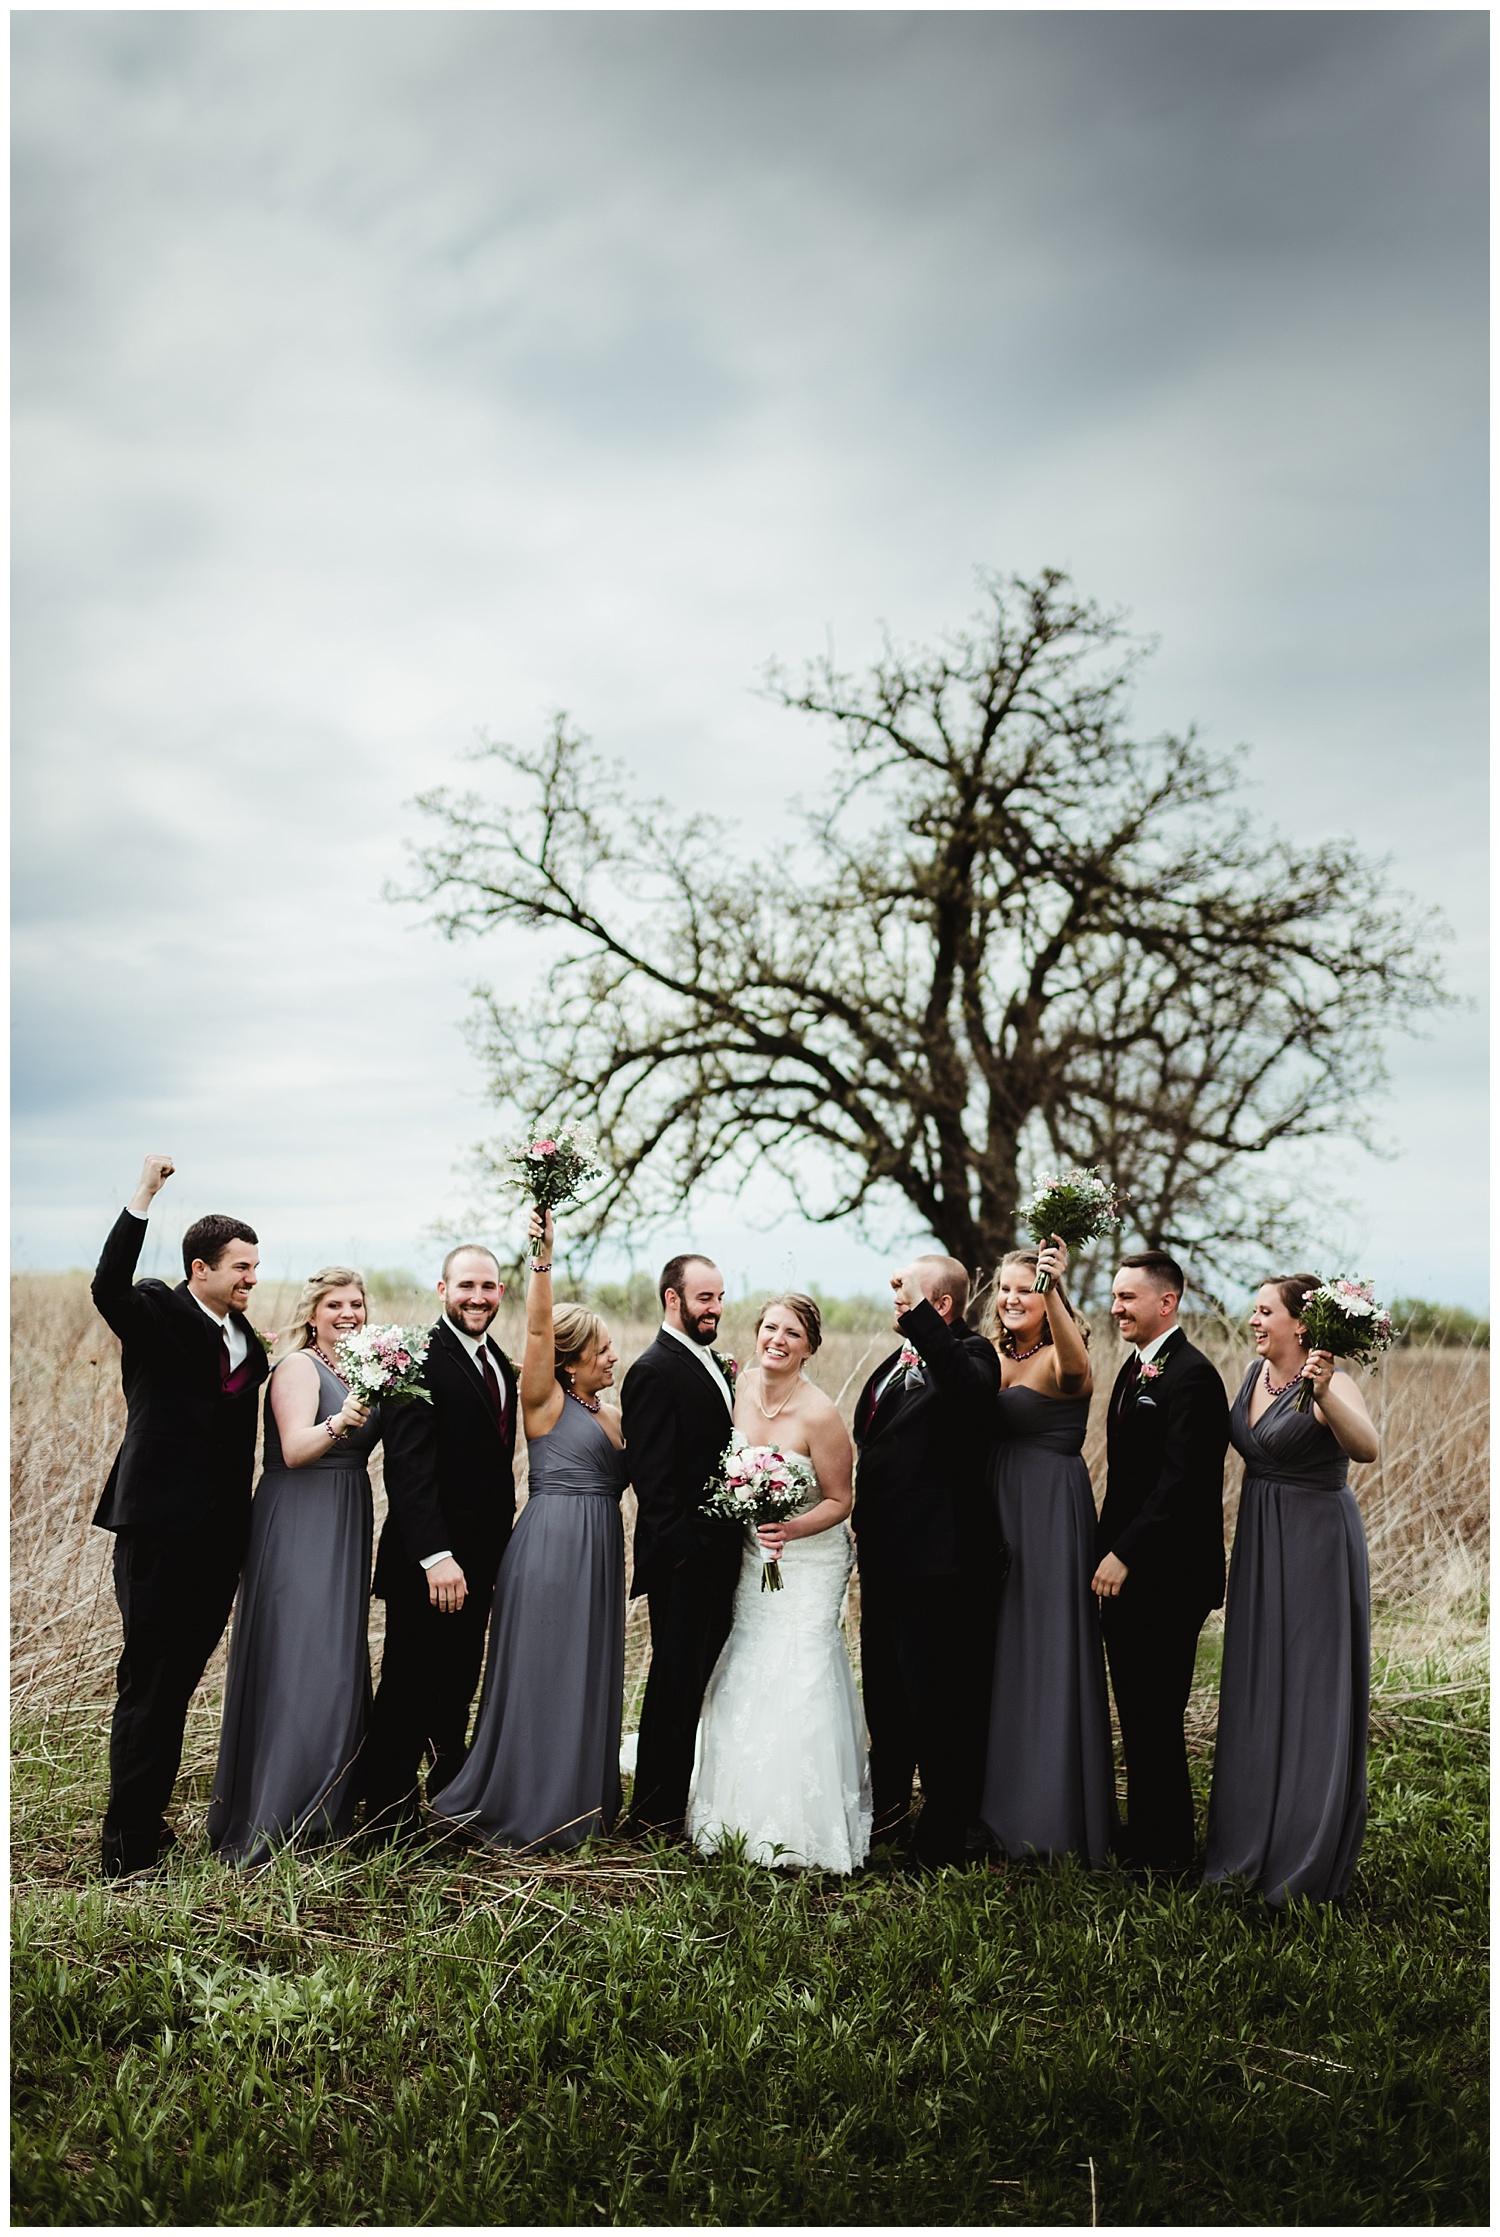 wedding party Kayla E. Photography.jpg